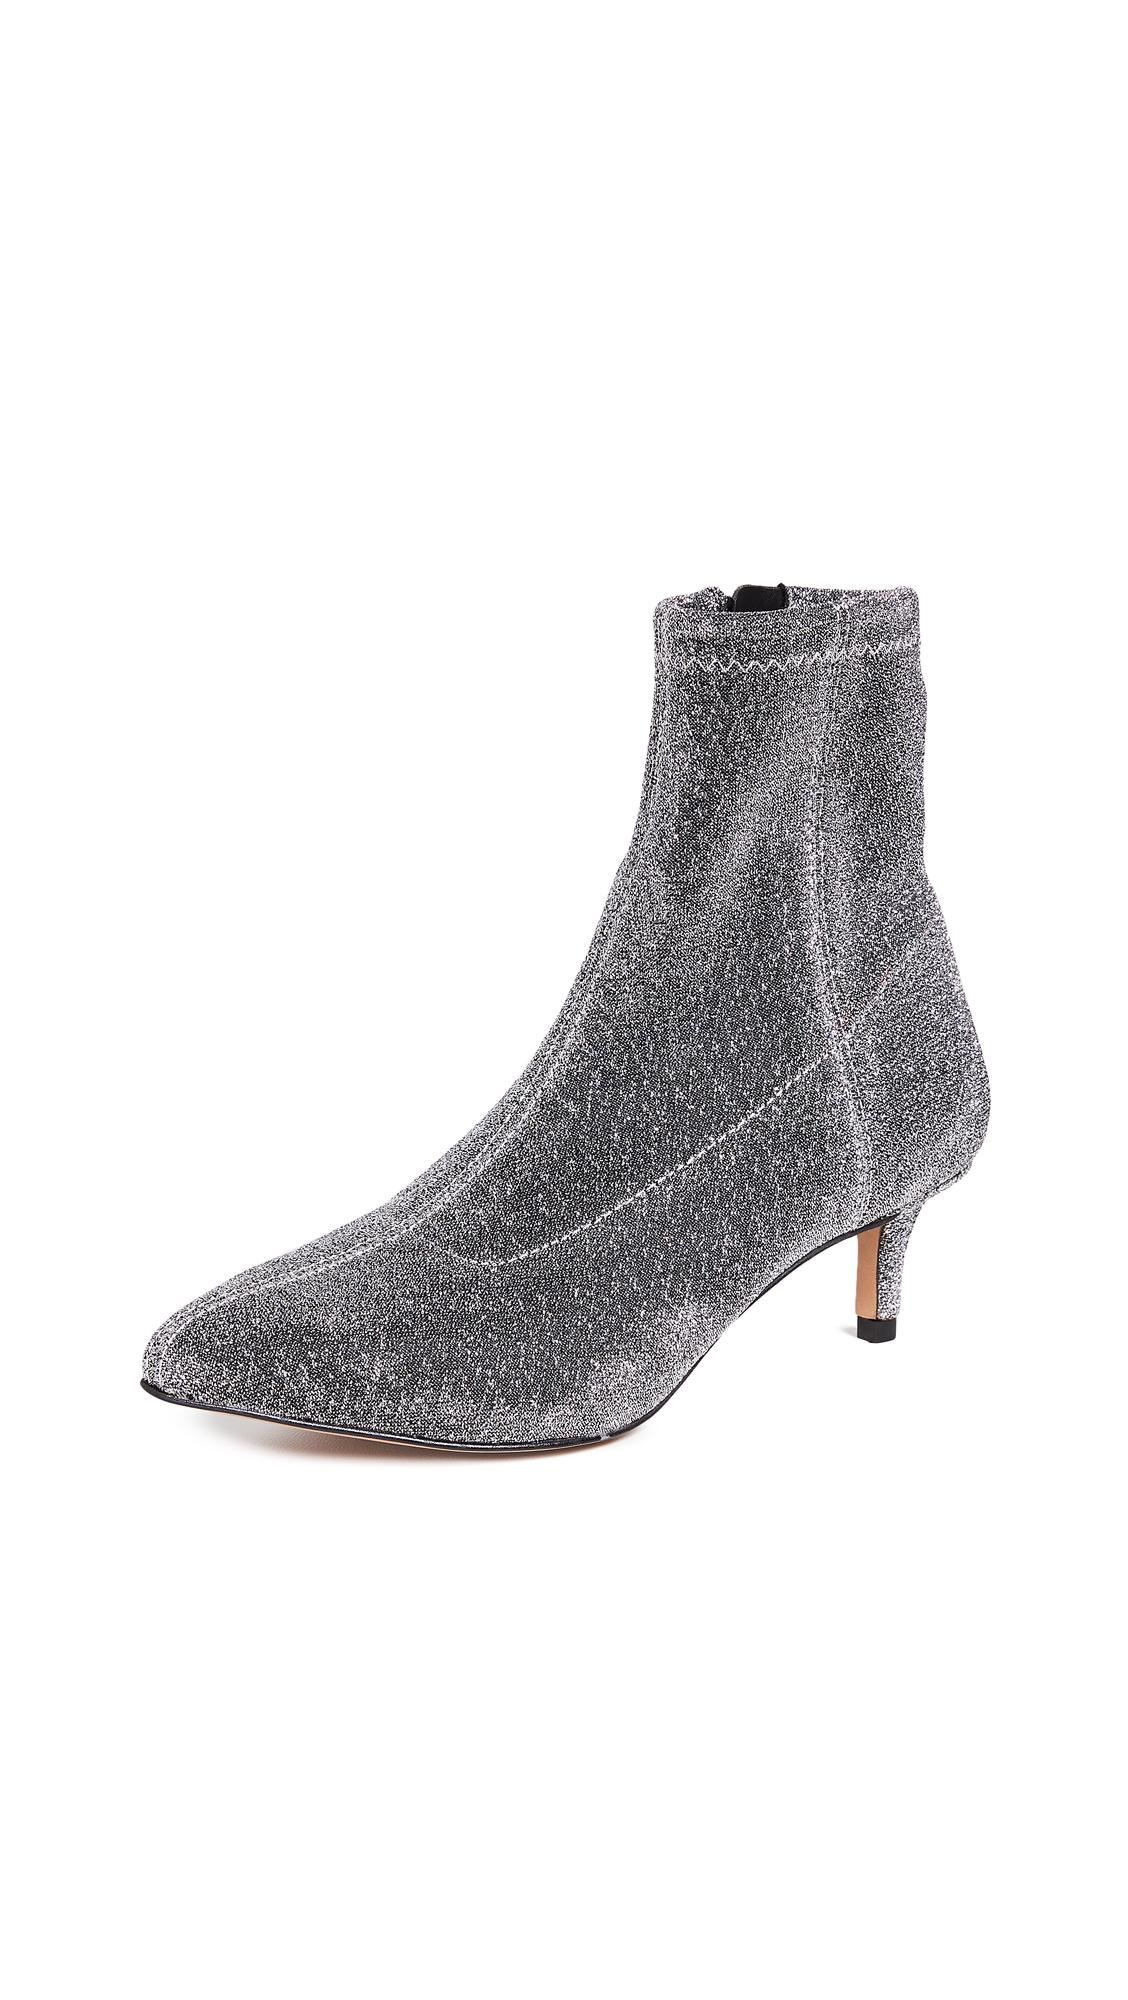 3d9f6ba828 Rebecca Minkoff Women's Sayres Glitter Kitten-Heel Booties In Silver ...